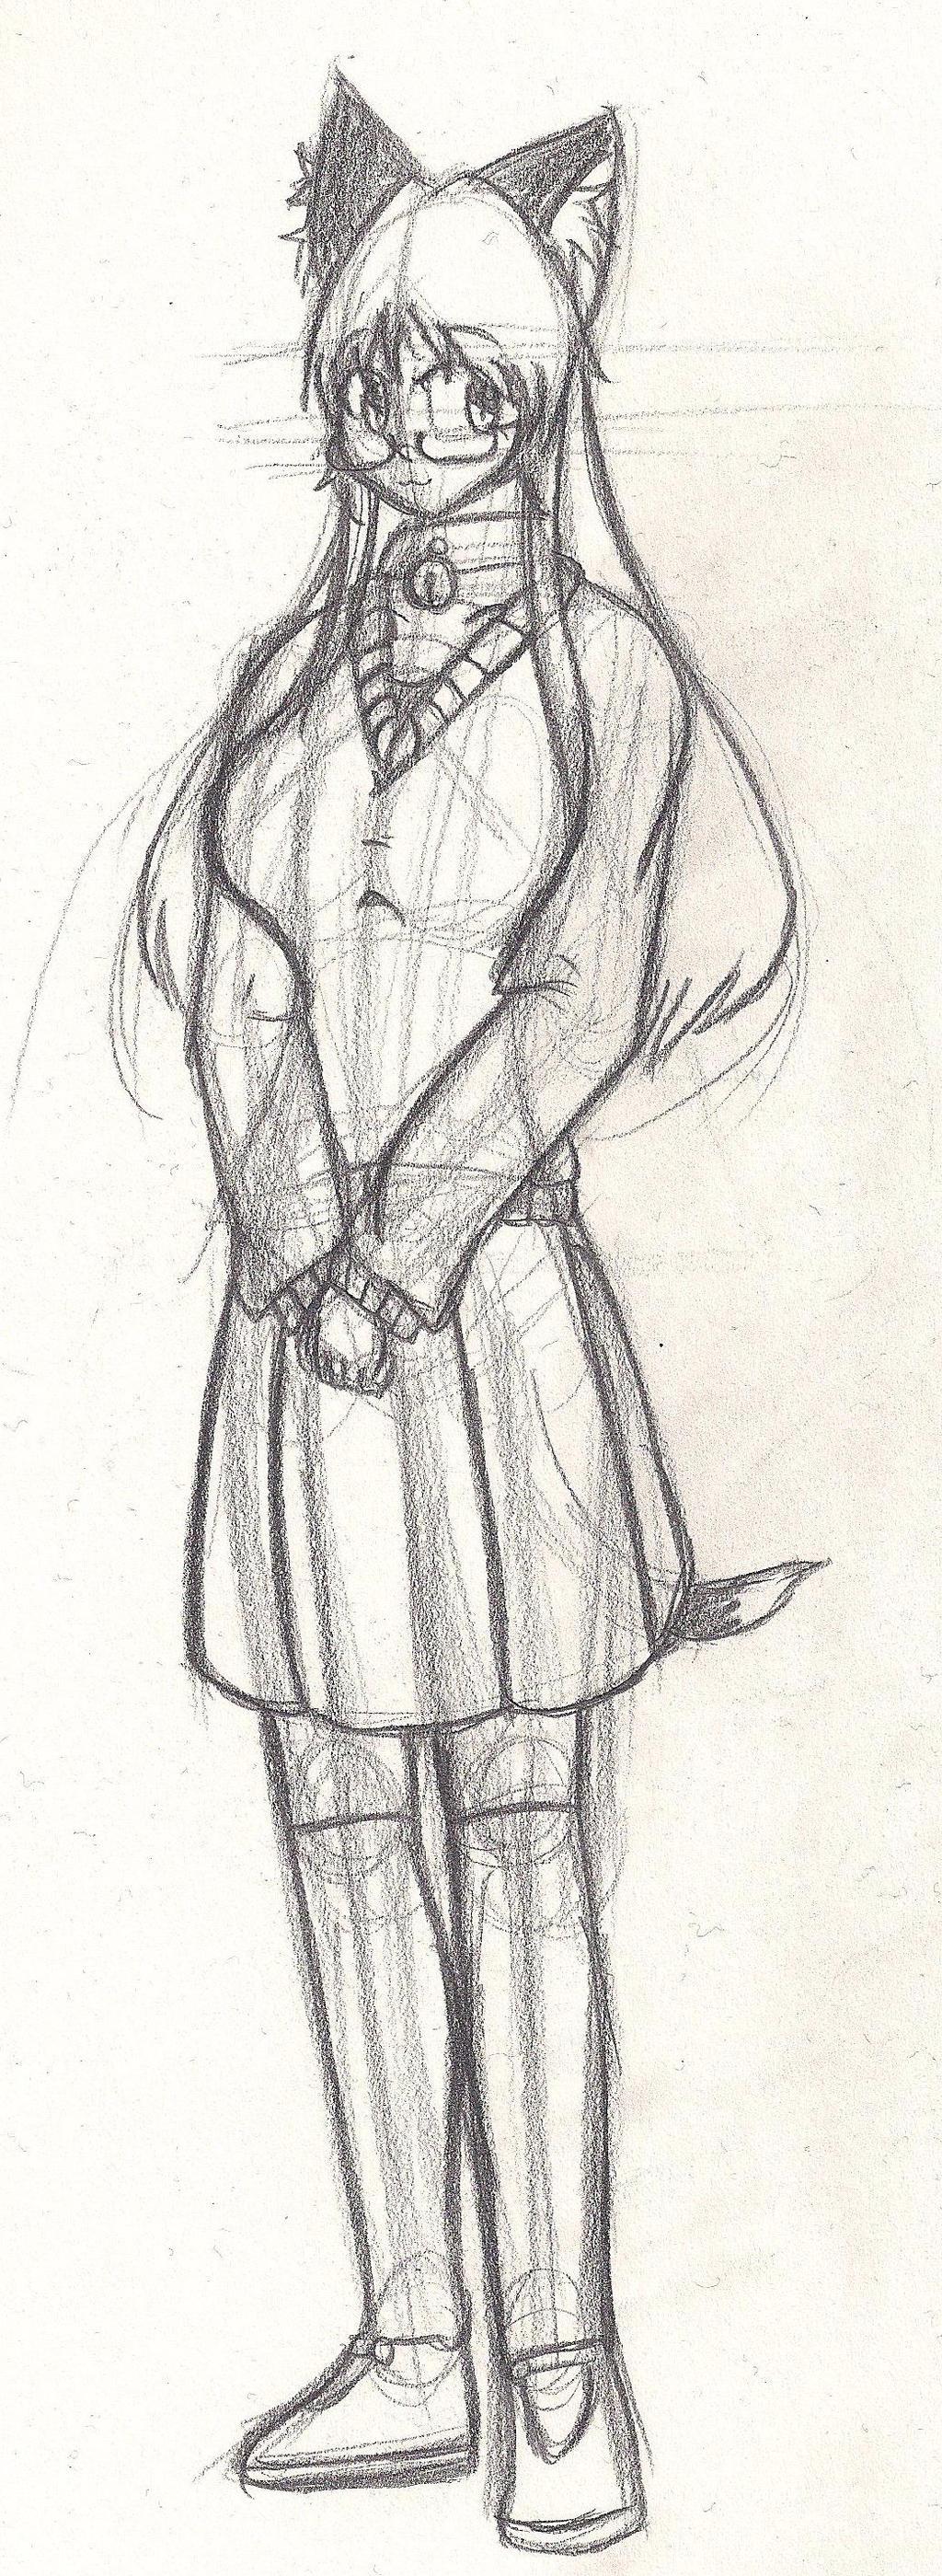 Miyari Nekoko doodle - 1/13/2014 by GlassMan-RV